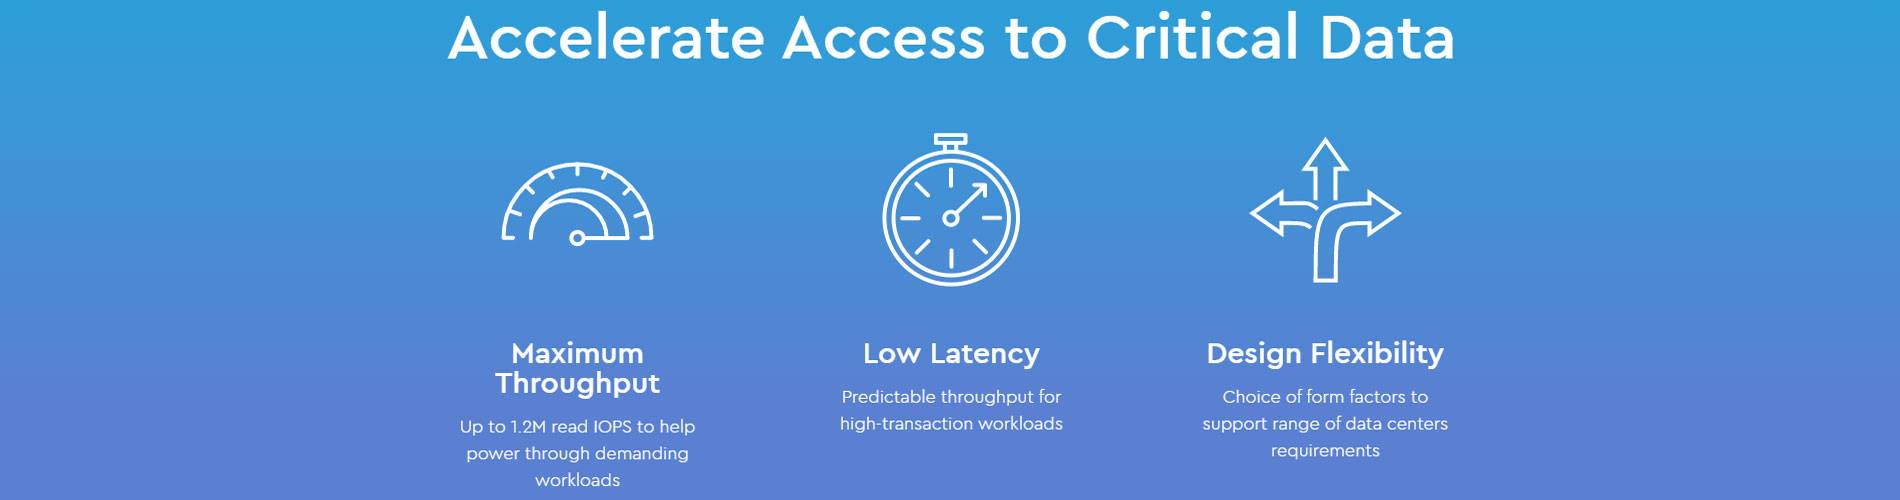 Accelerate Access to Critical Data